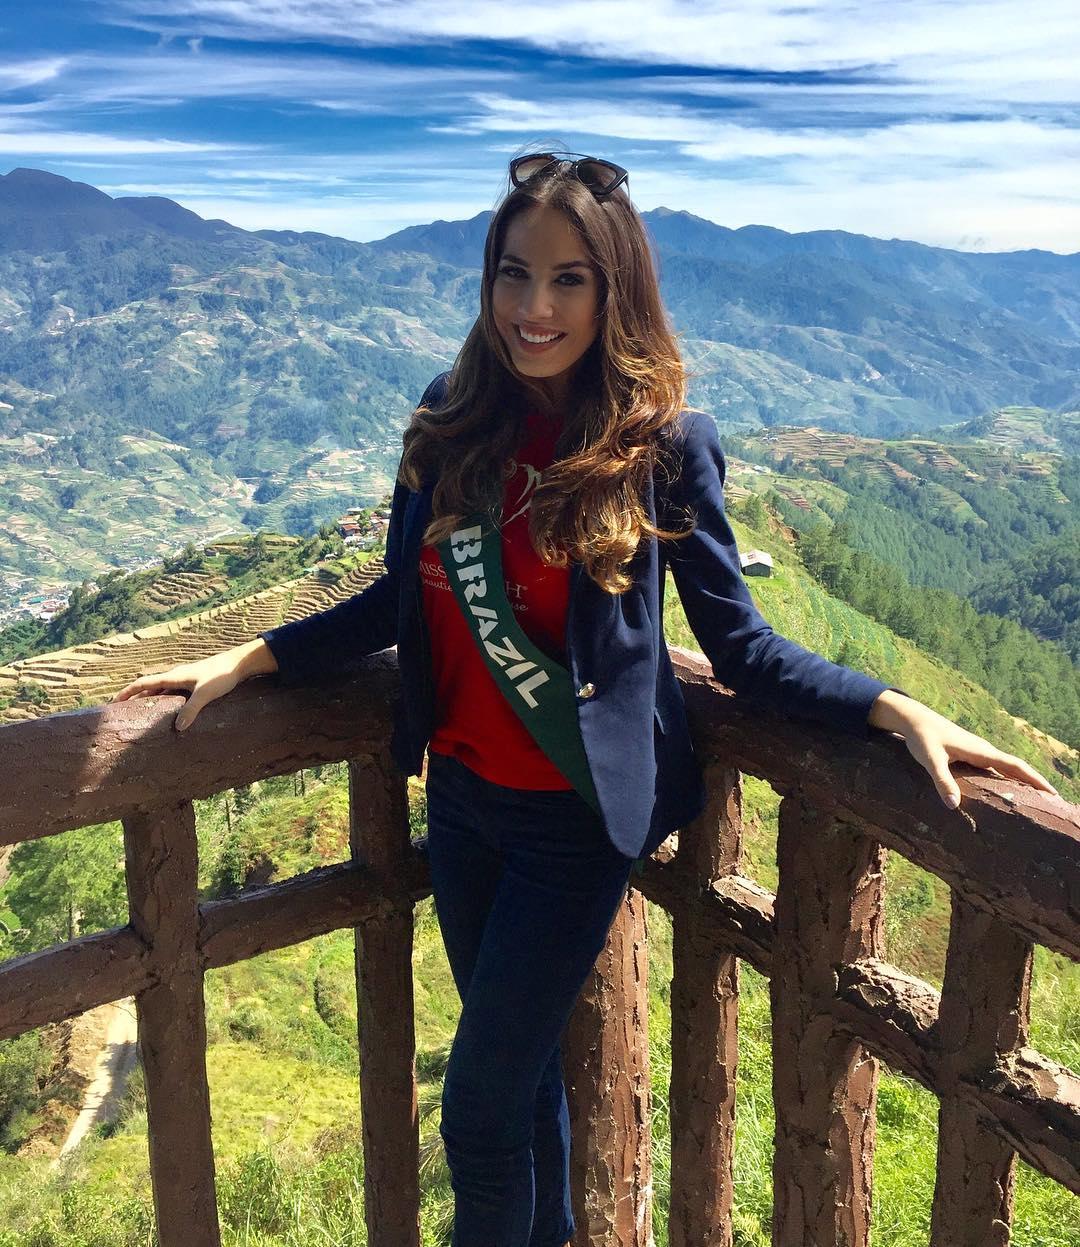 bruna zanardo, 1st runner-up de miss supranational brazil 2020/miss brasil internacional 2017/miss brasil terra 2016. - Página 6 Tonc62bl